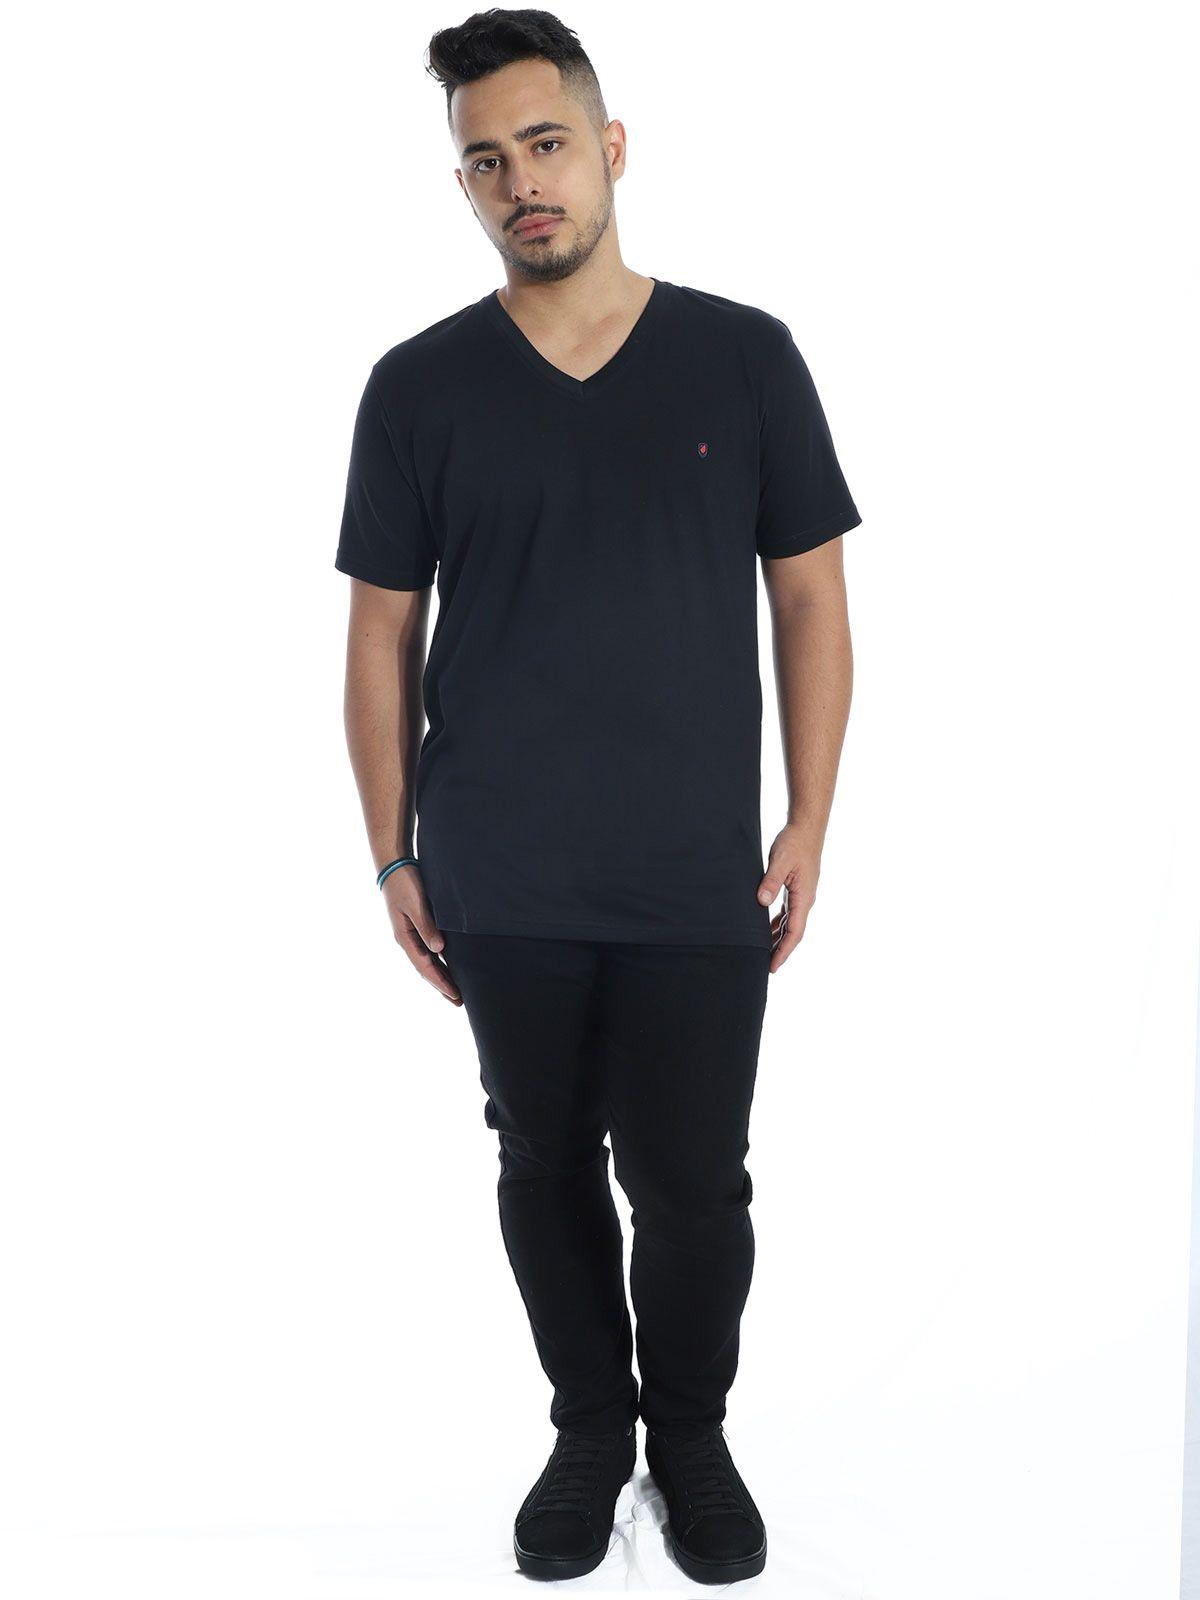 Camiseta Anistia Básica Decote V. Chest Preto